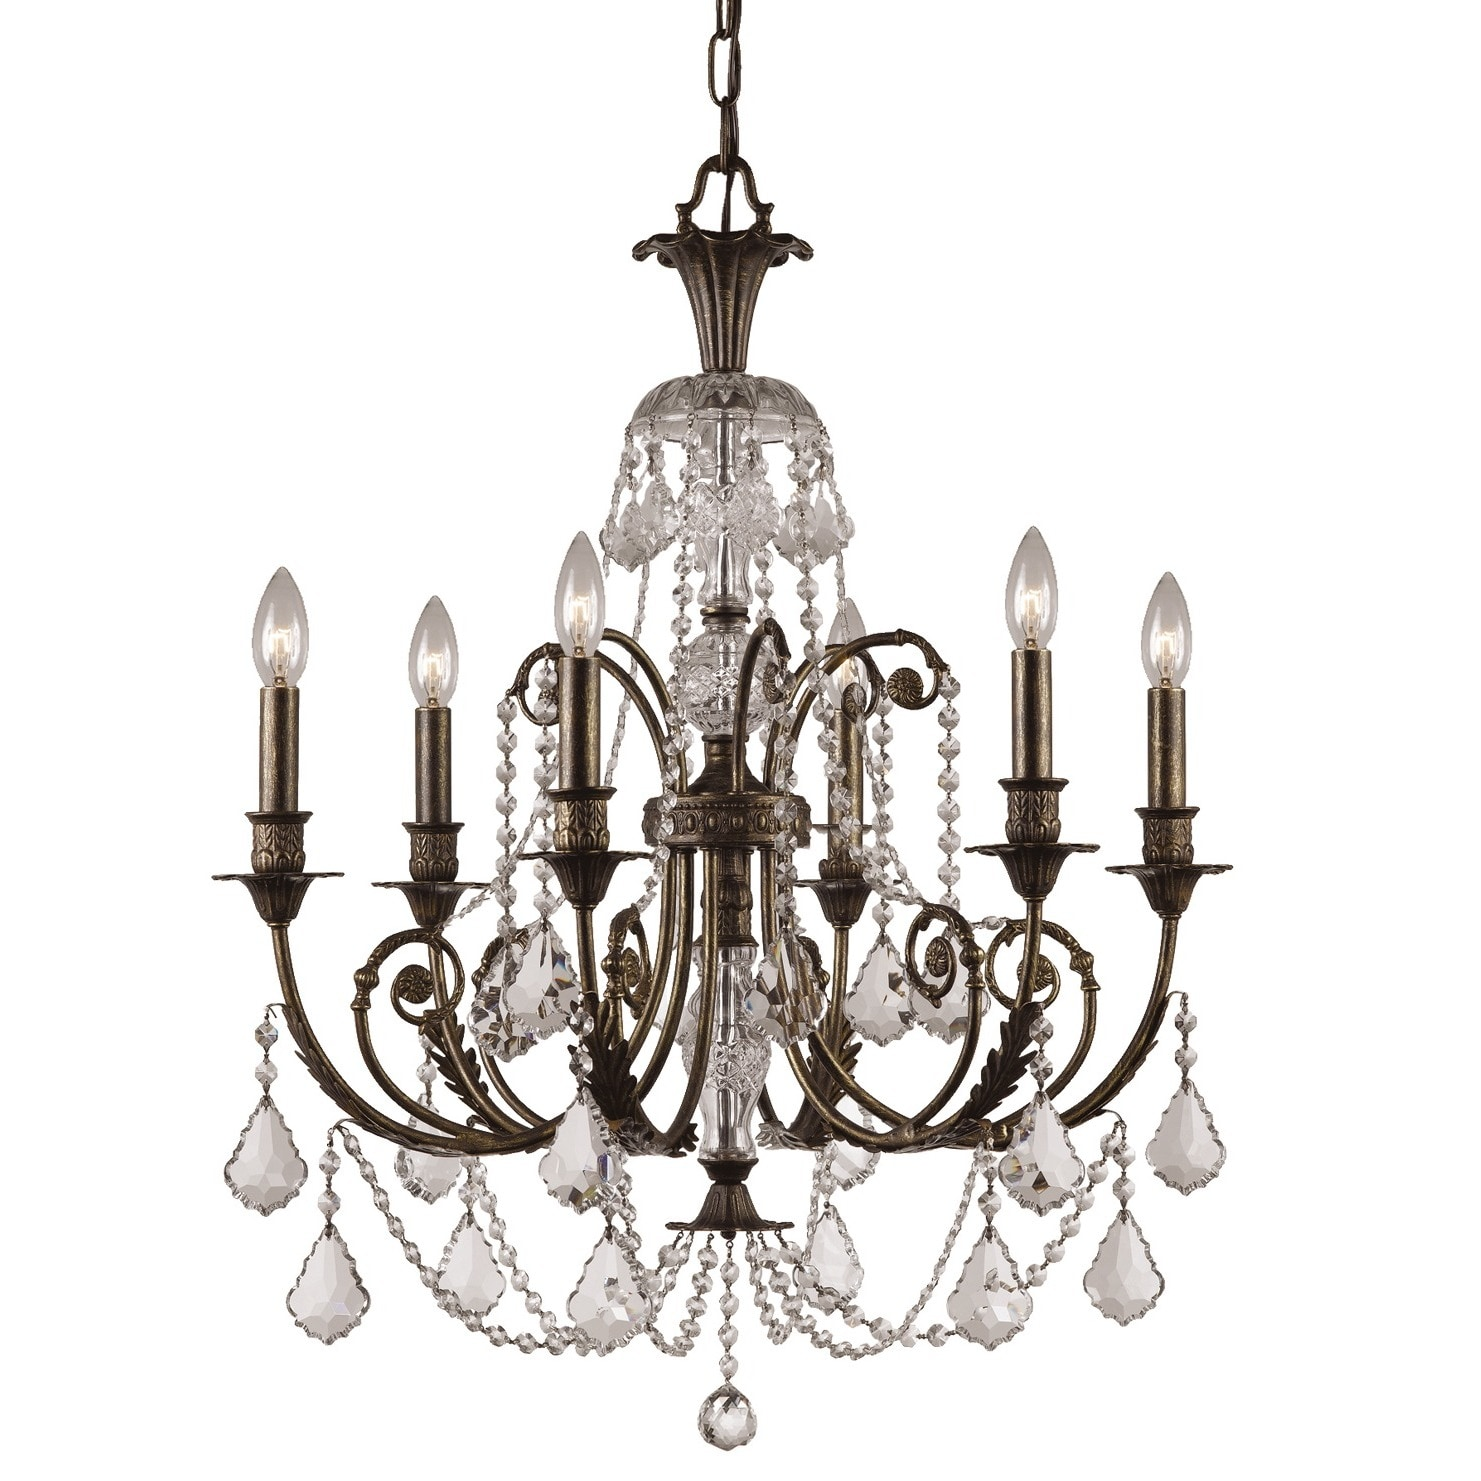 Shop Regis 6-light English Bronze/ Crystal Chandelier - On Sale - Overstock  - 6391269